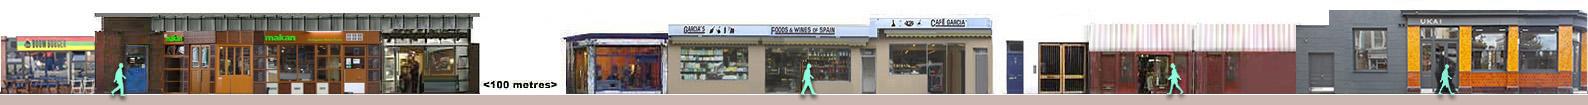 Portobello Road shops